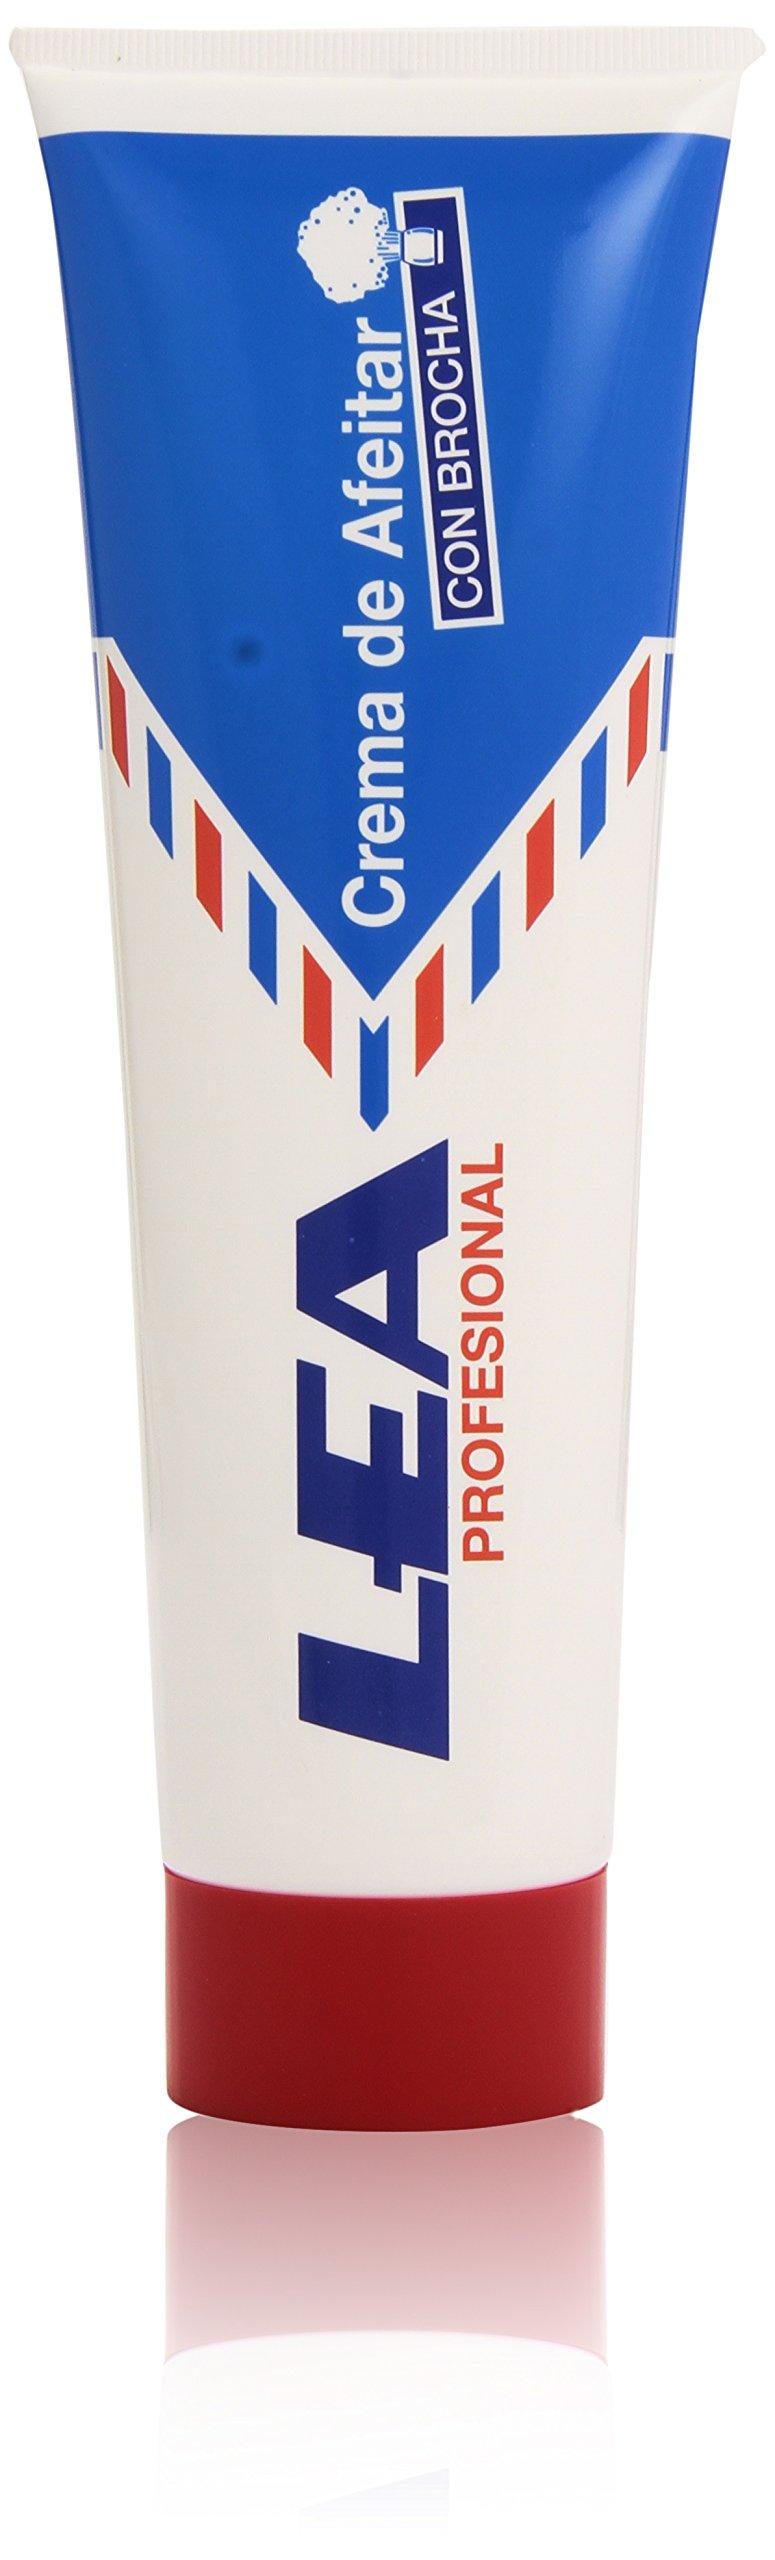 Lea Shaving Cream Professional Barber Size Tube 250ml